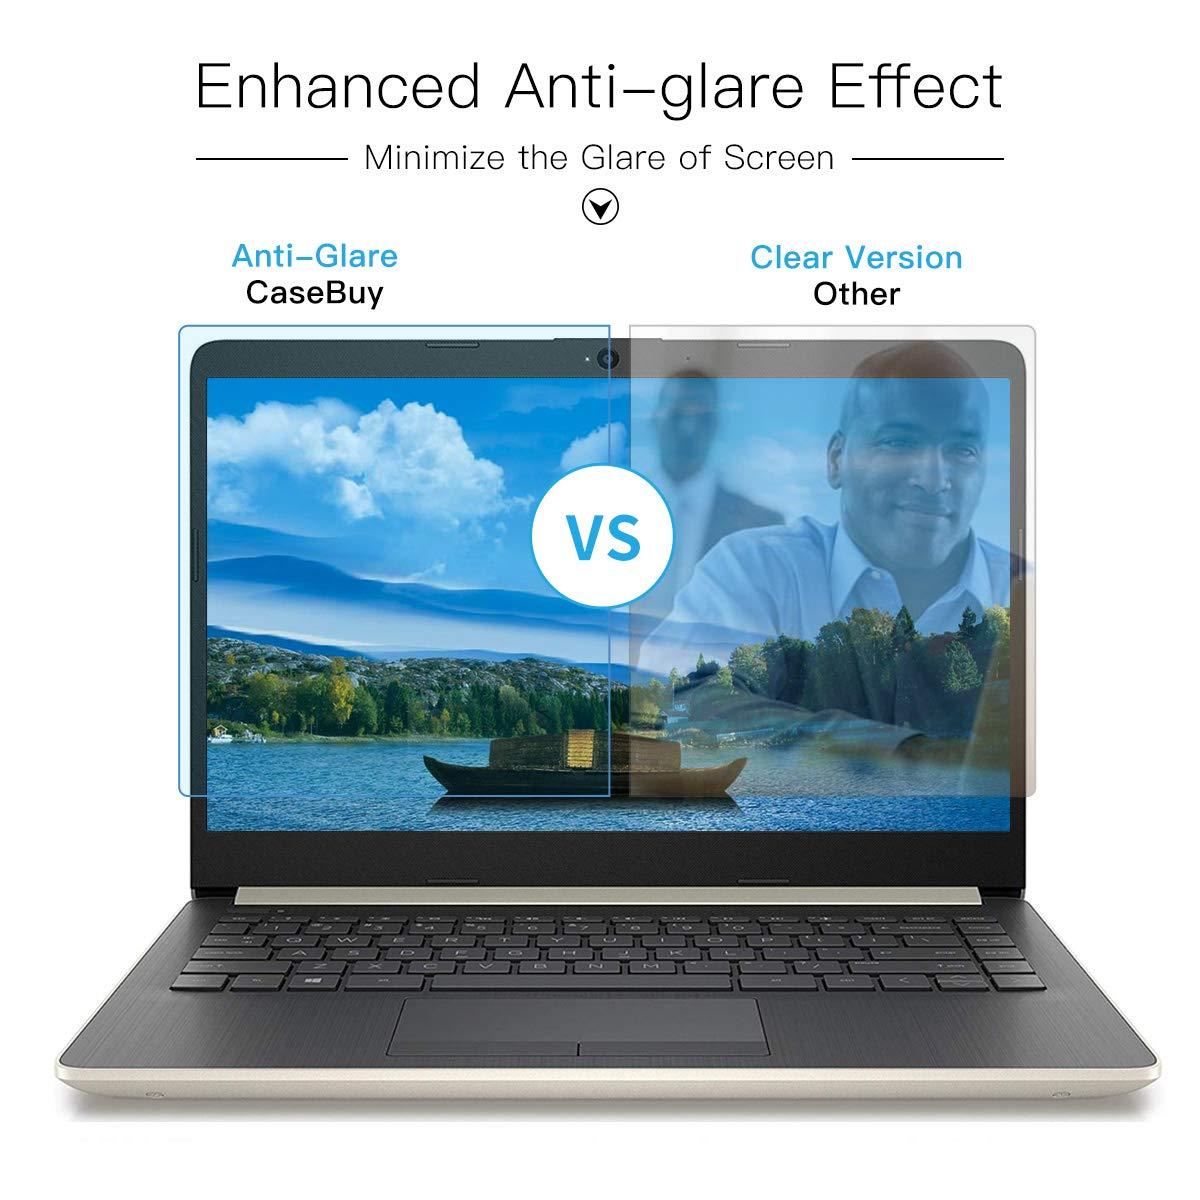 CaseBuy Displayschutzfolie f/ür Lenovo Yoga 720 2-in-1 33,8 cm 13,3 Zoll 13,3 Zoll und ultrad/ünne TPU-Tastaturabdeckung f/ür Yoga 720